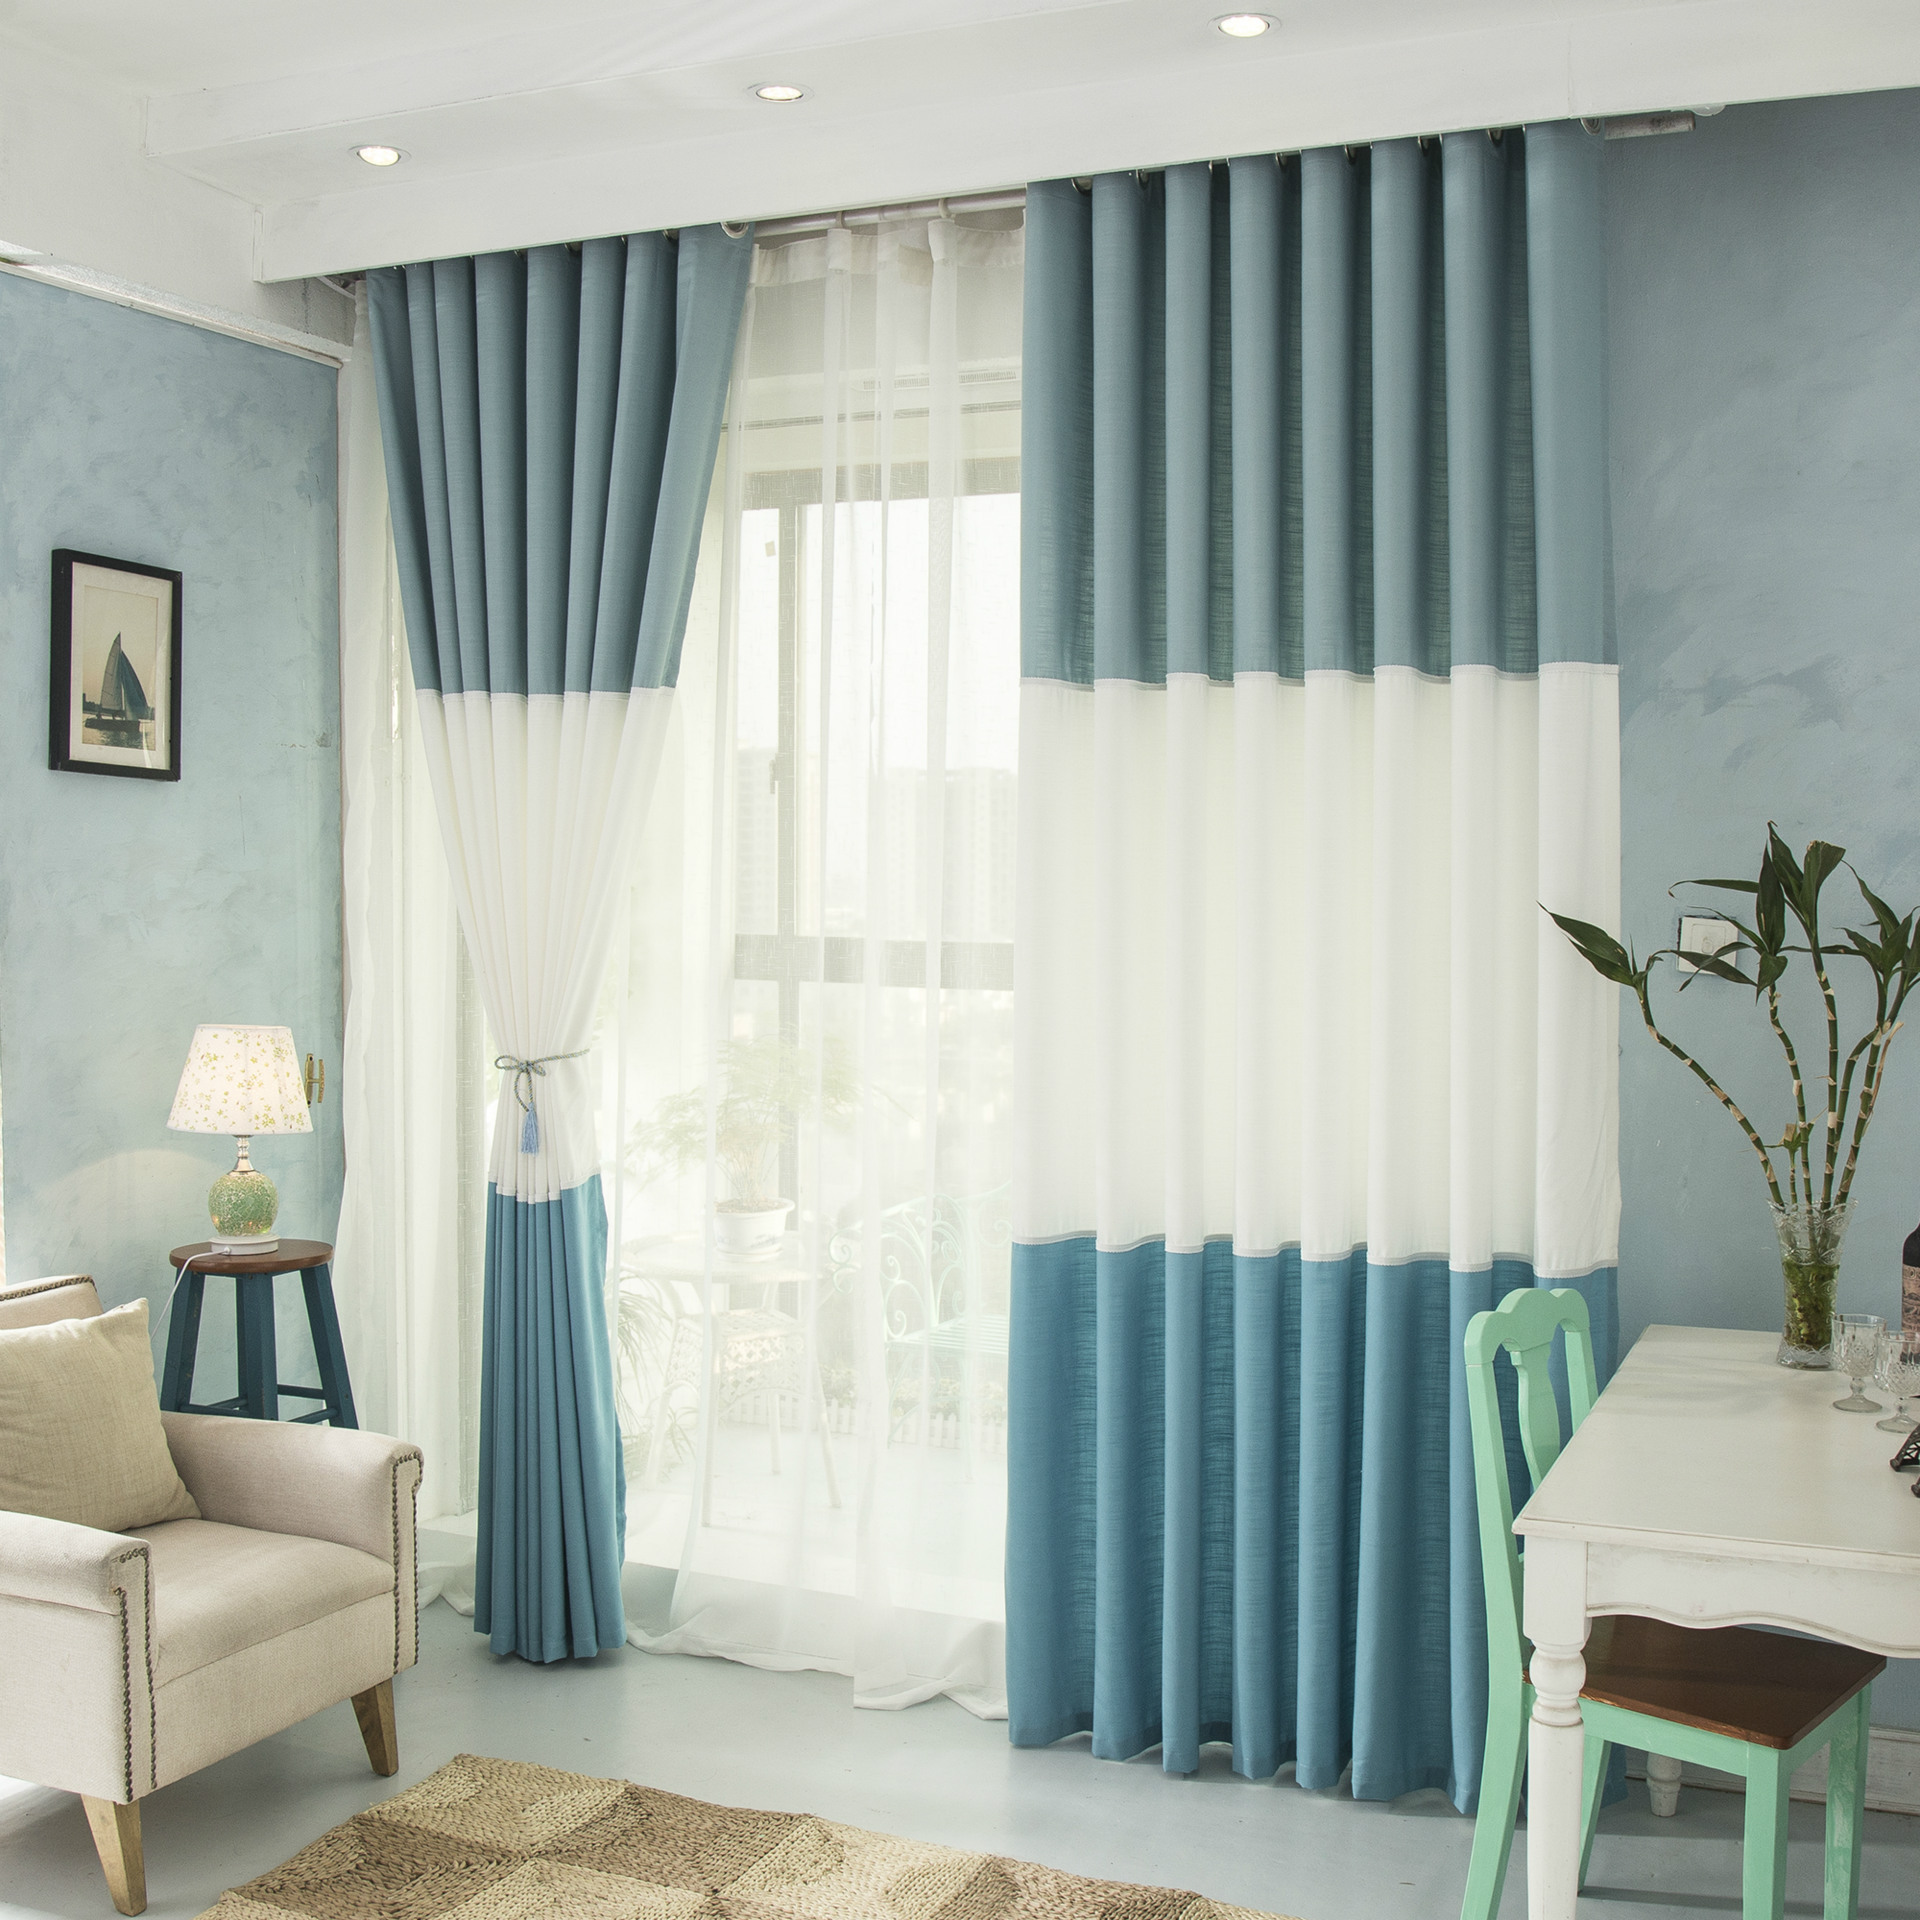 cortinas de saln comedor dormitorio cortina de tela de algodn de costura pequea fresca sombra a